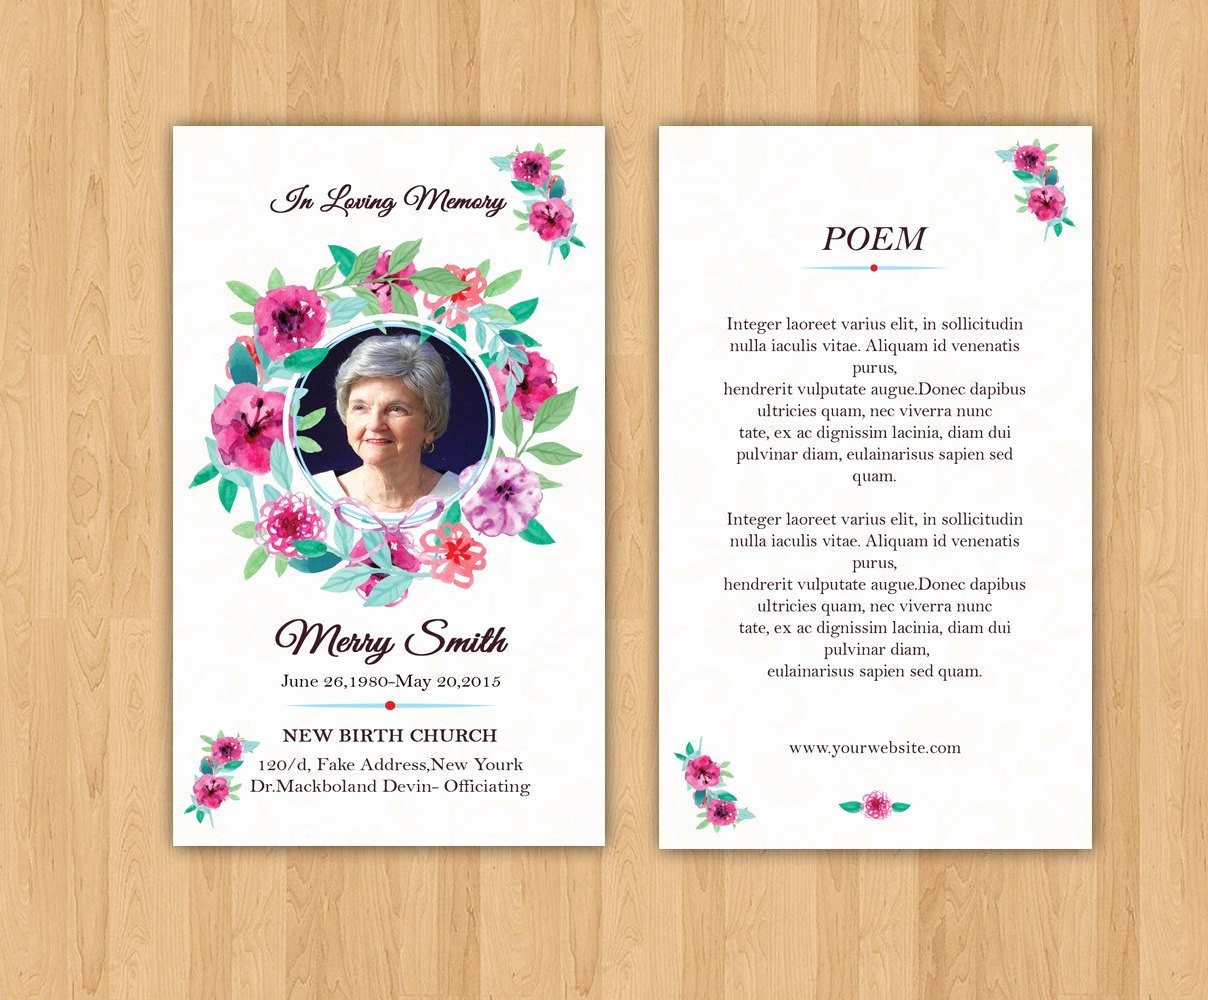 Funeral Prayer Cards Template Elegant Funeral Prayer Card Template Editable Ms Word & Shop